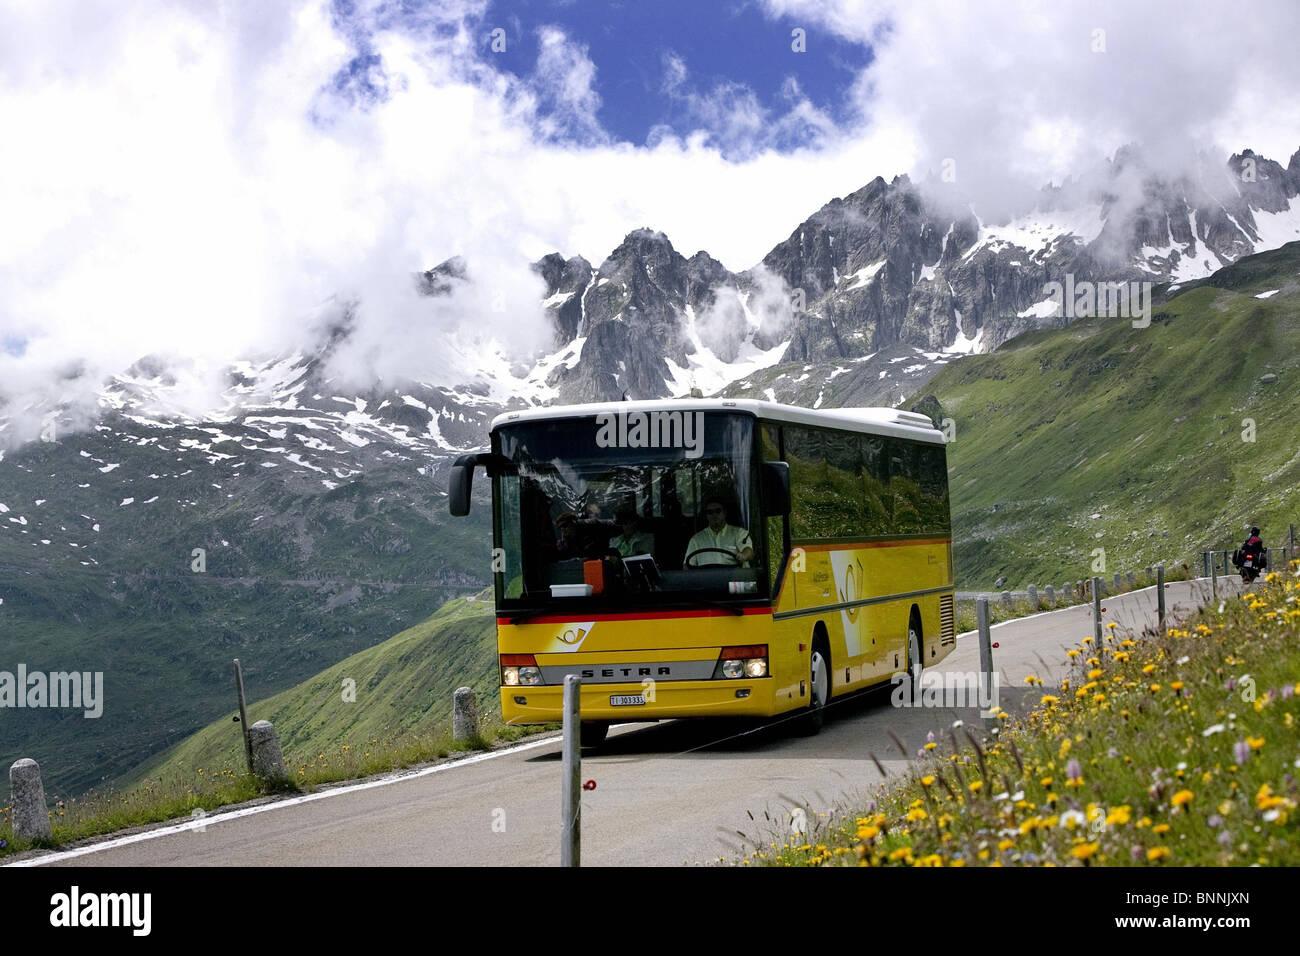 Switzerland swiss traffic bus Furka Pass postal car canton Uri mountain pass flowers flower meadow mountains clouds - Stock Image